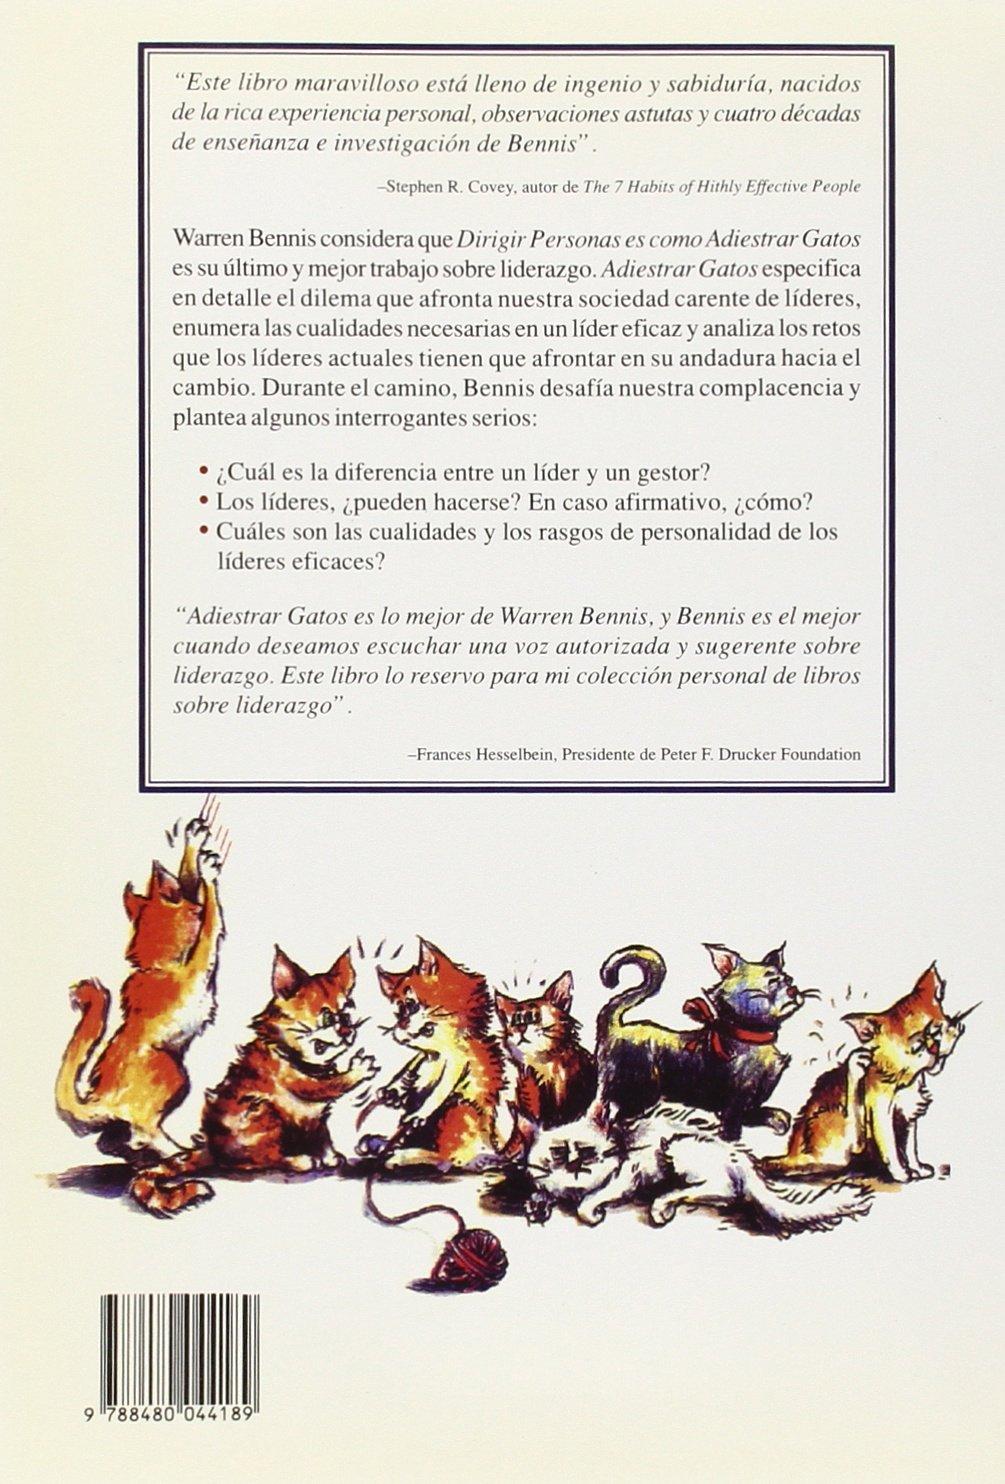 Dirigir personas es como adiestrar gatos: Warren Bennis: 9788480044189: Amazon.com: Books